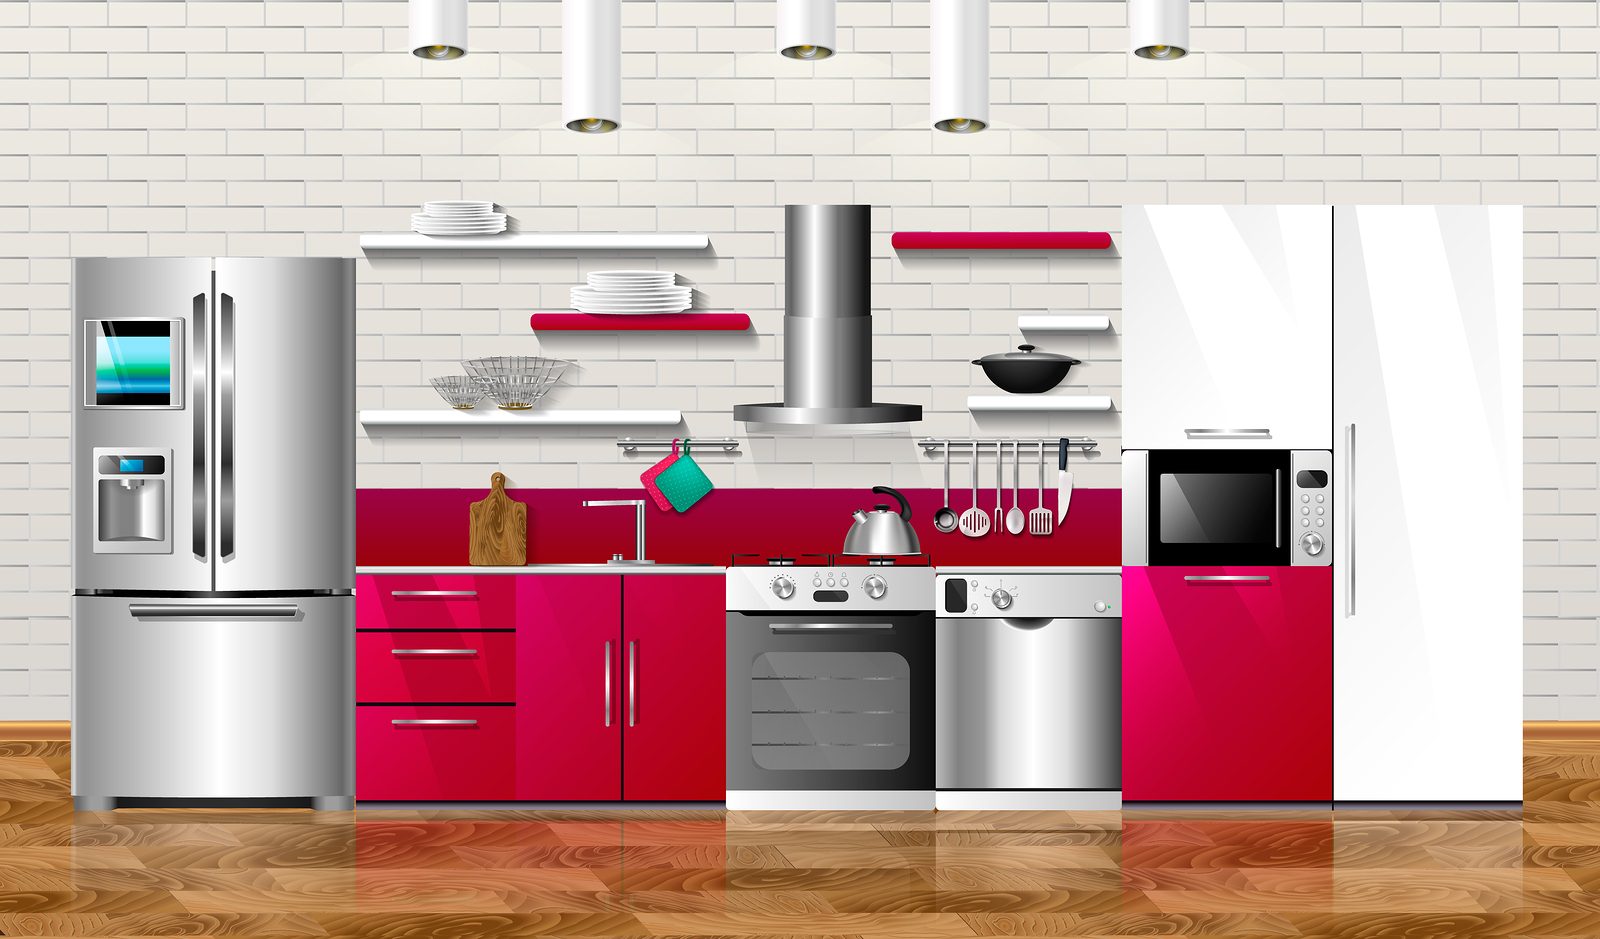 Appliance Repair Near Me (Cost & Service) -Checklist